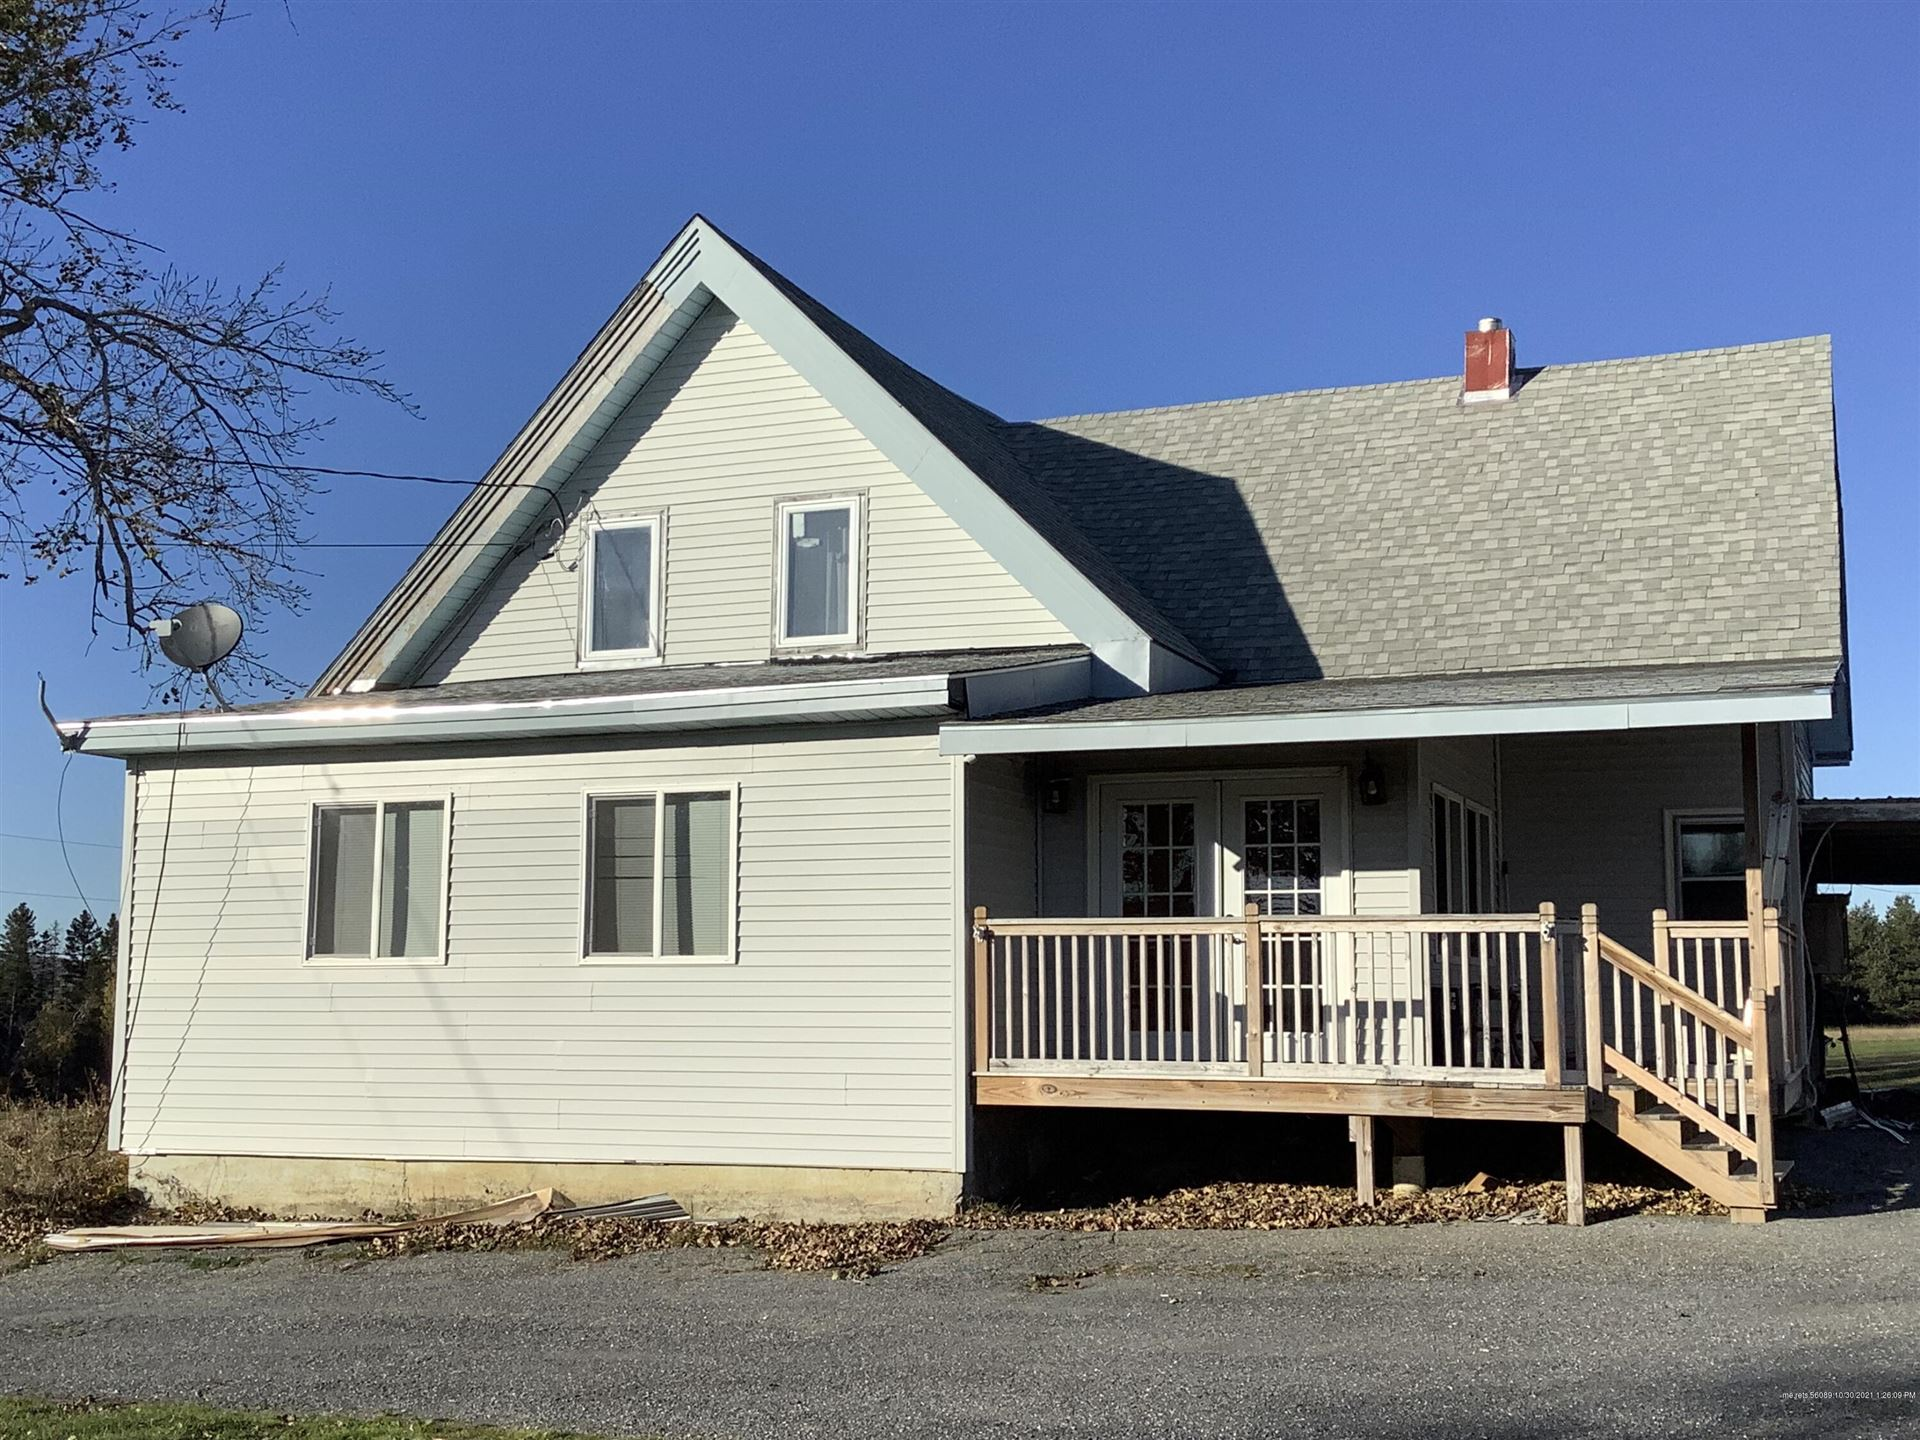 Photo of 14 Grant Road, Fort Fairfield, ME 04742 (MLS # 1505940)